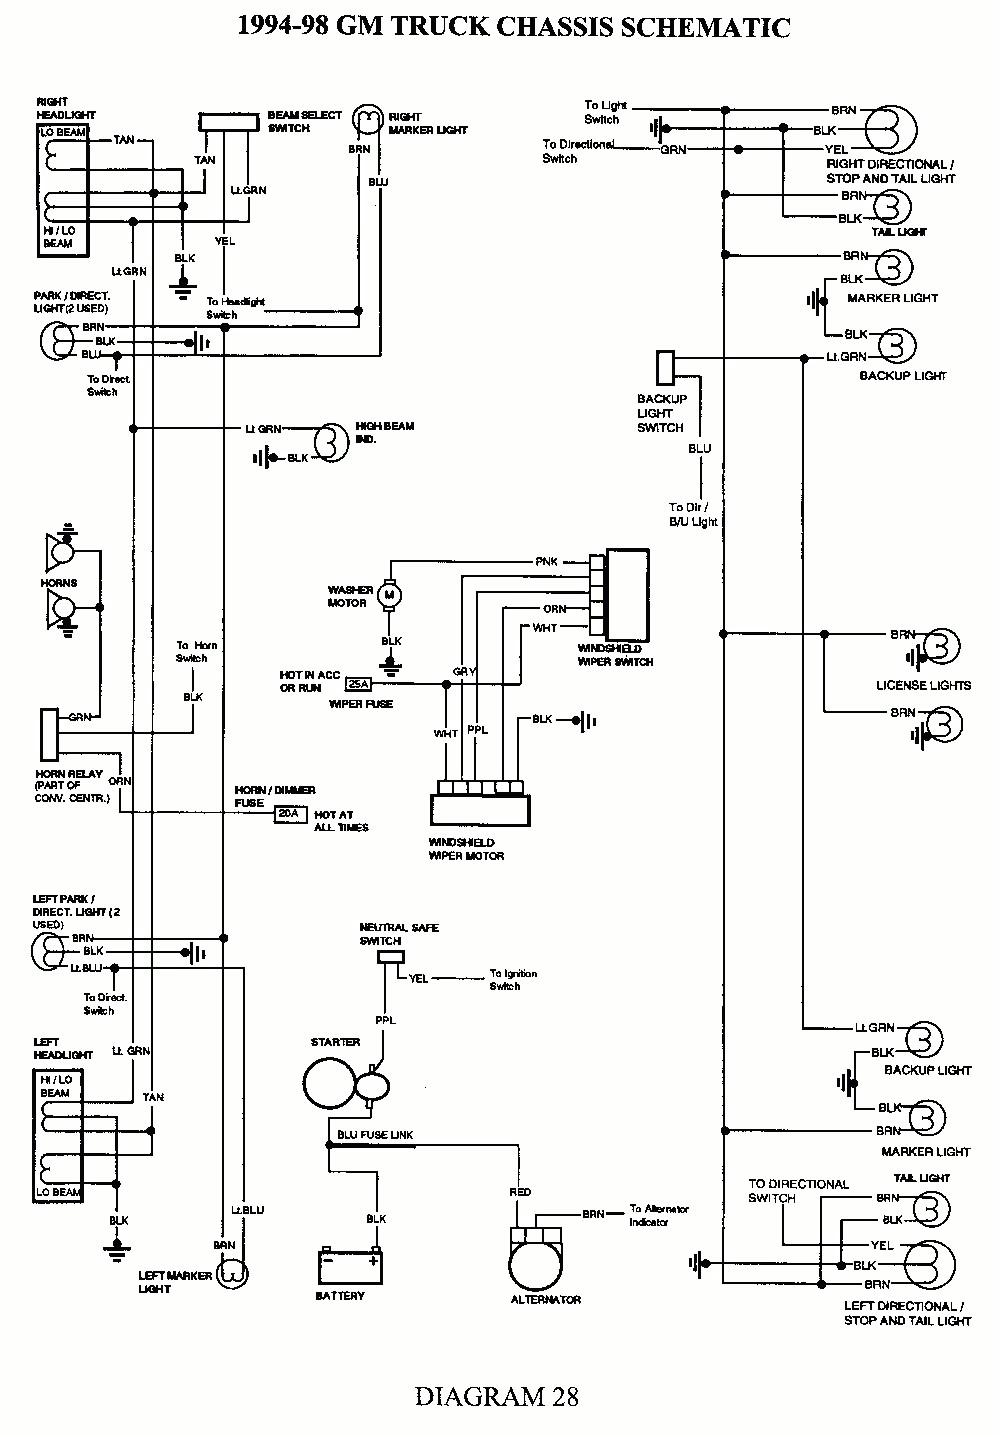 1998 chevy silverado tail light wiring diagram 89 schematic gm wire 1992 truck gif